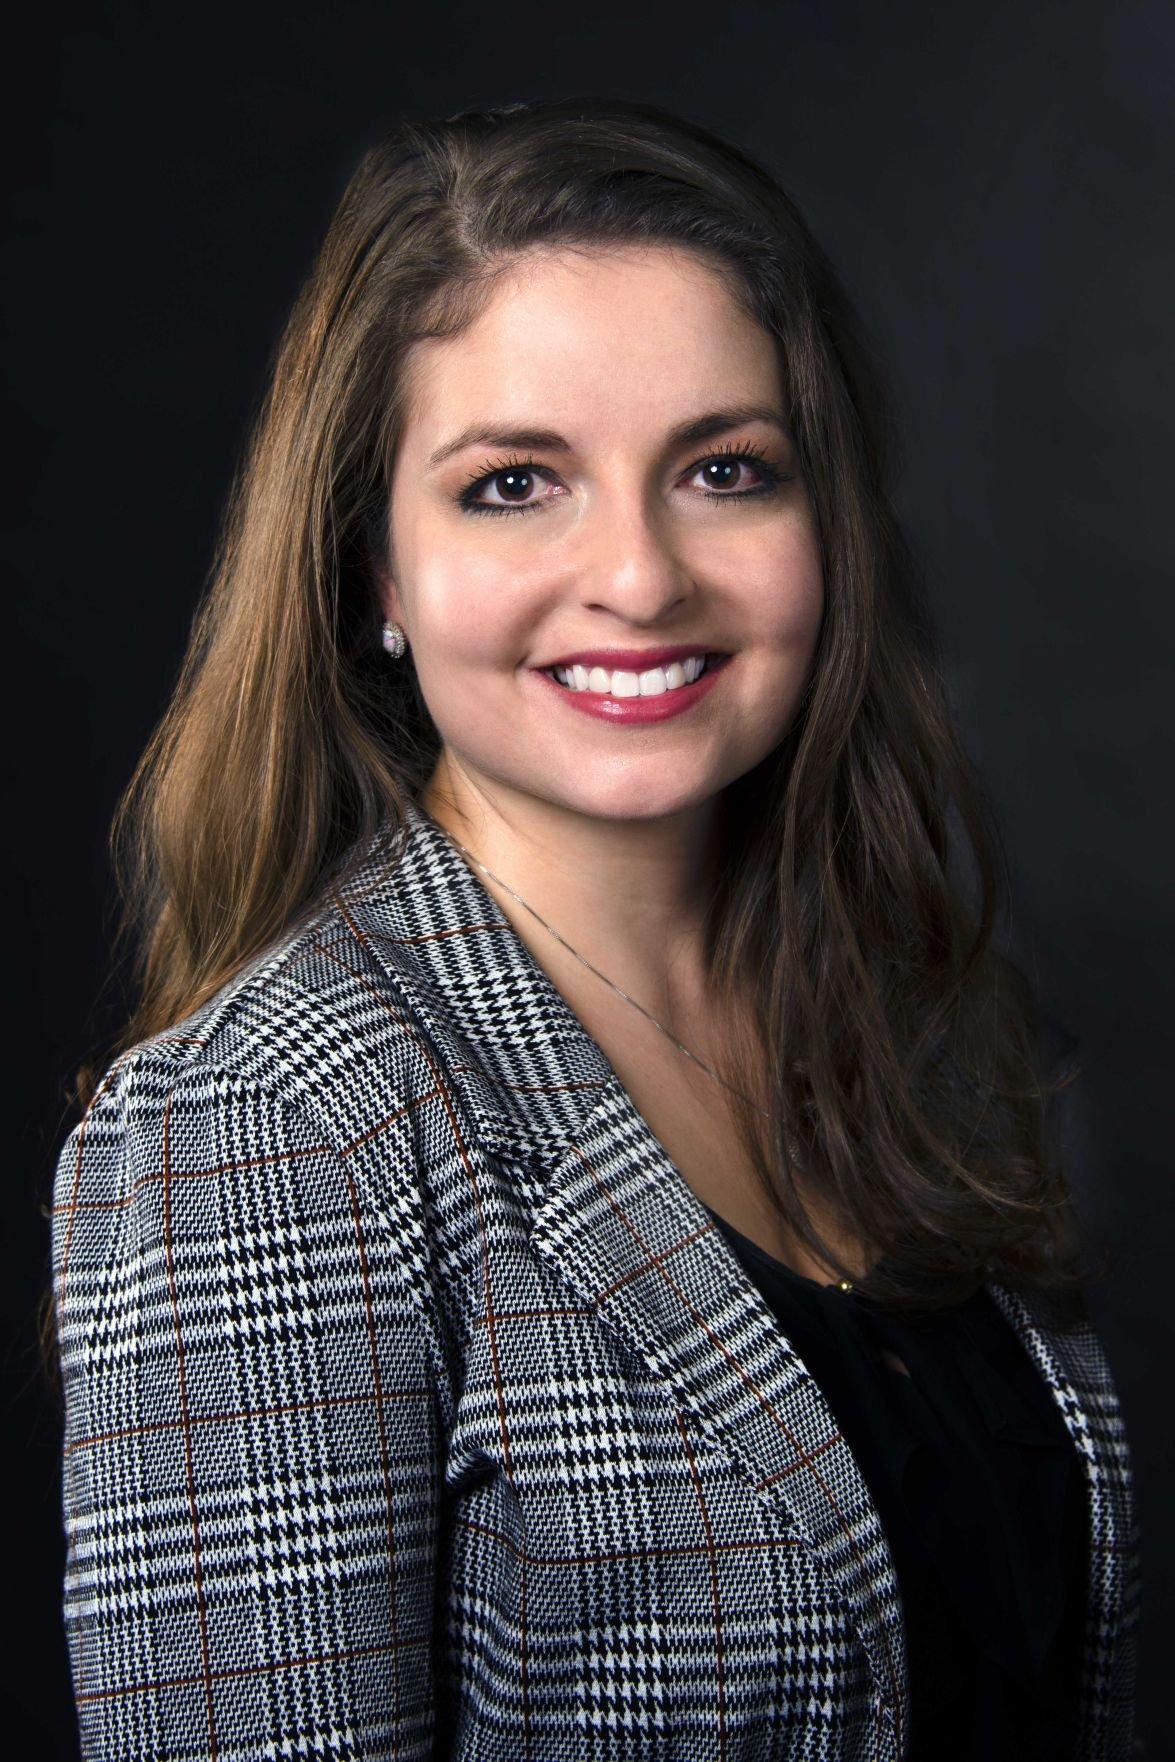 Michelle Balfay